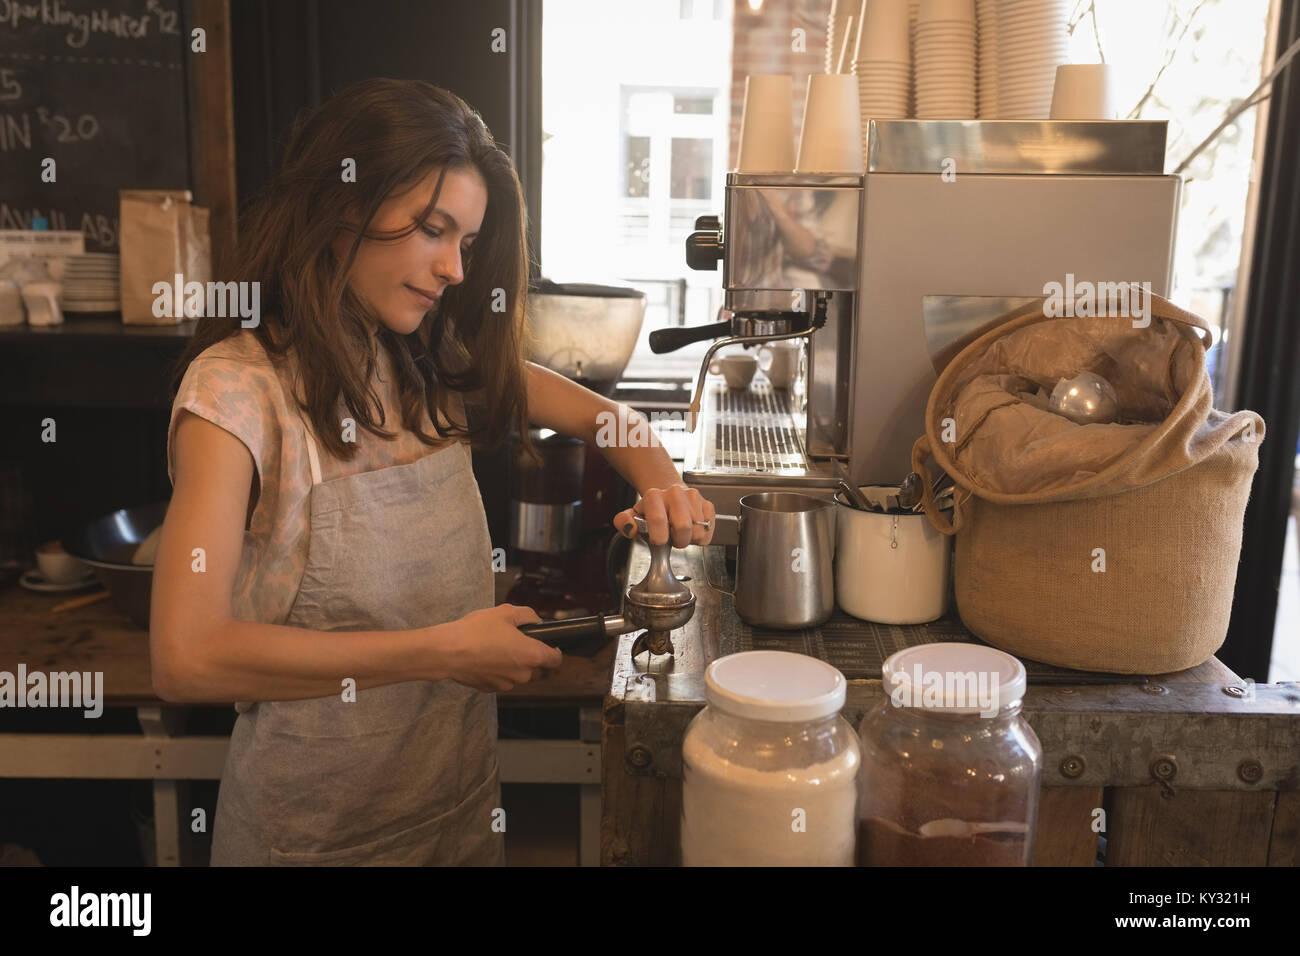 Barista utilizando una prensa antisabotaje para café molido en un portafilter Imagen De Stock